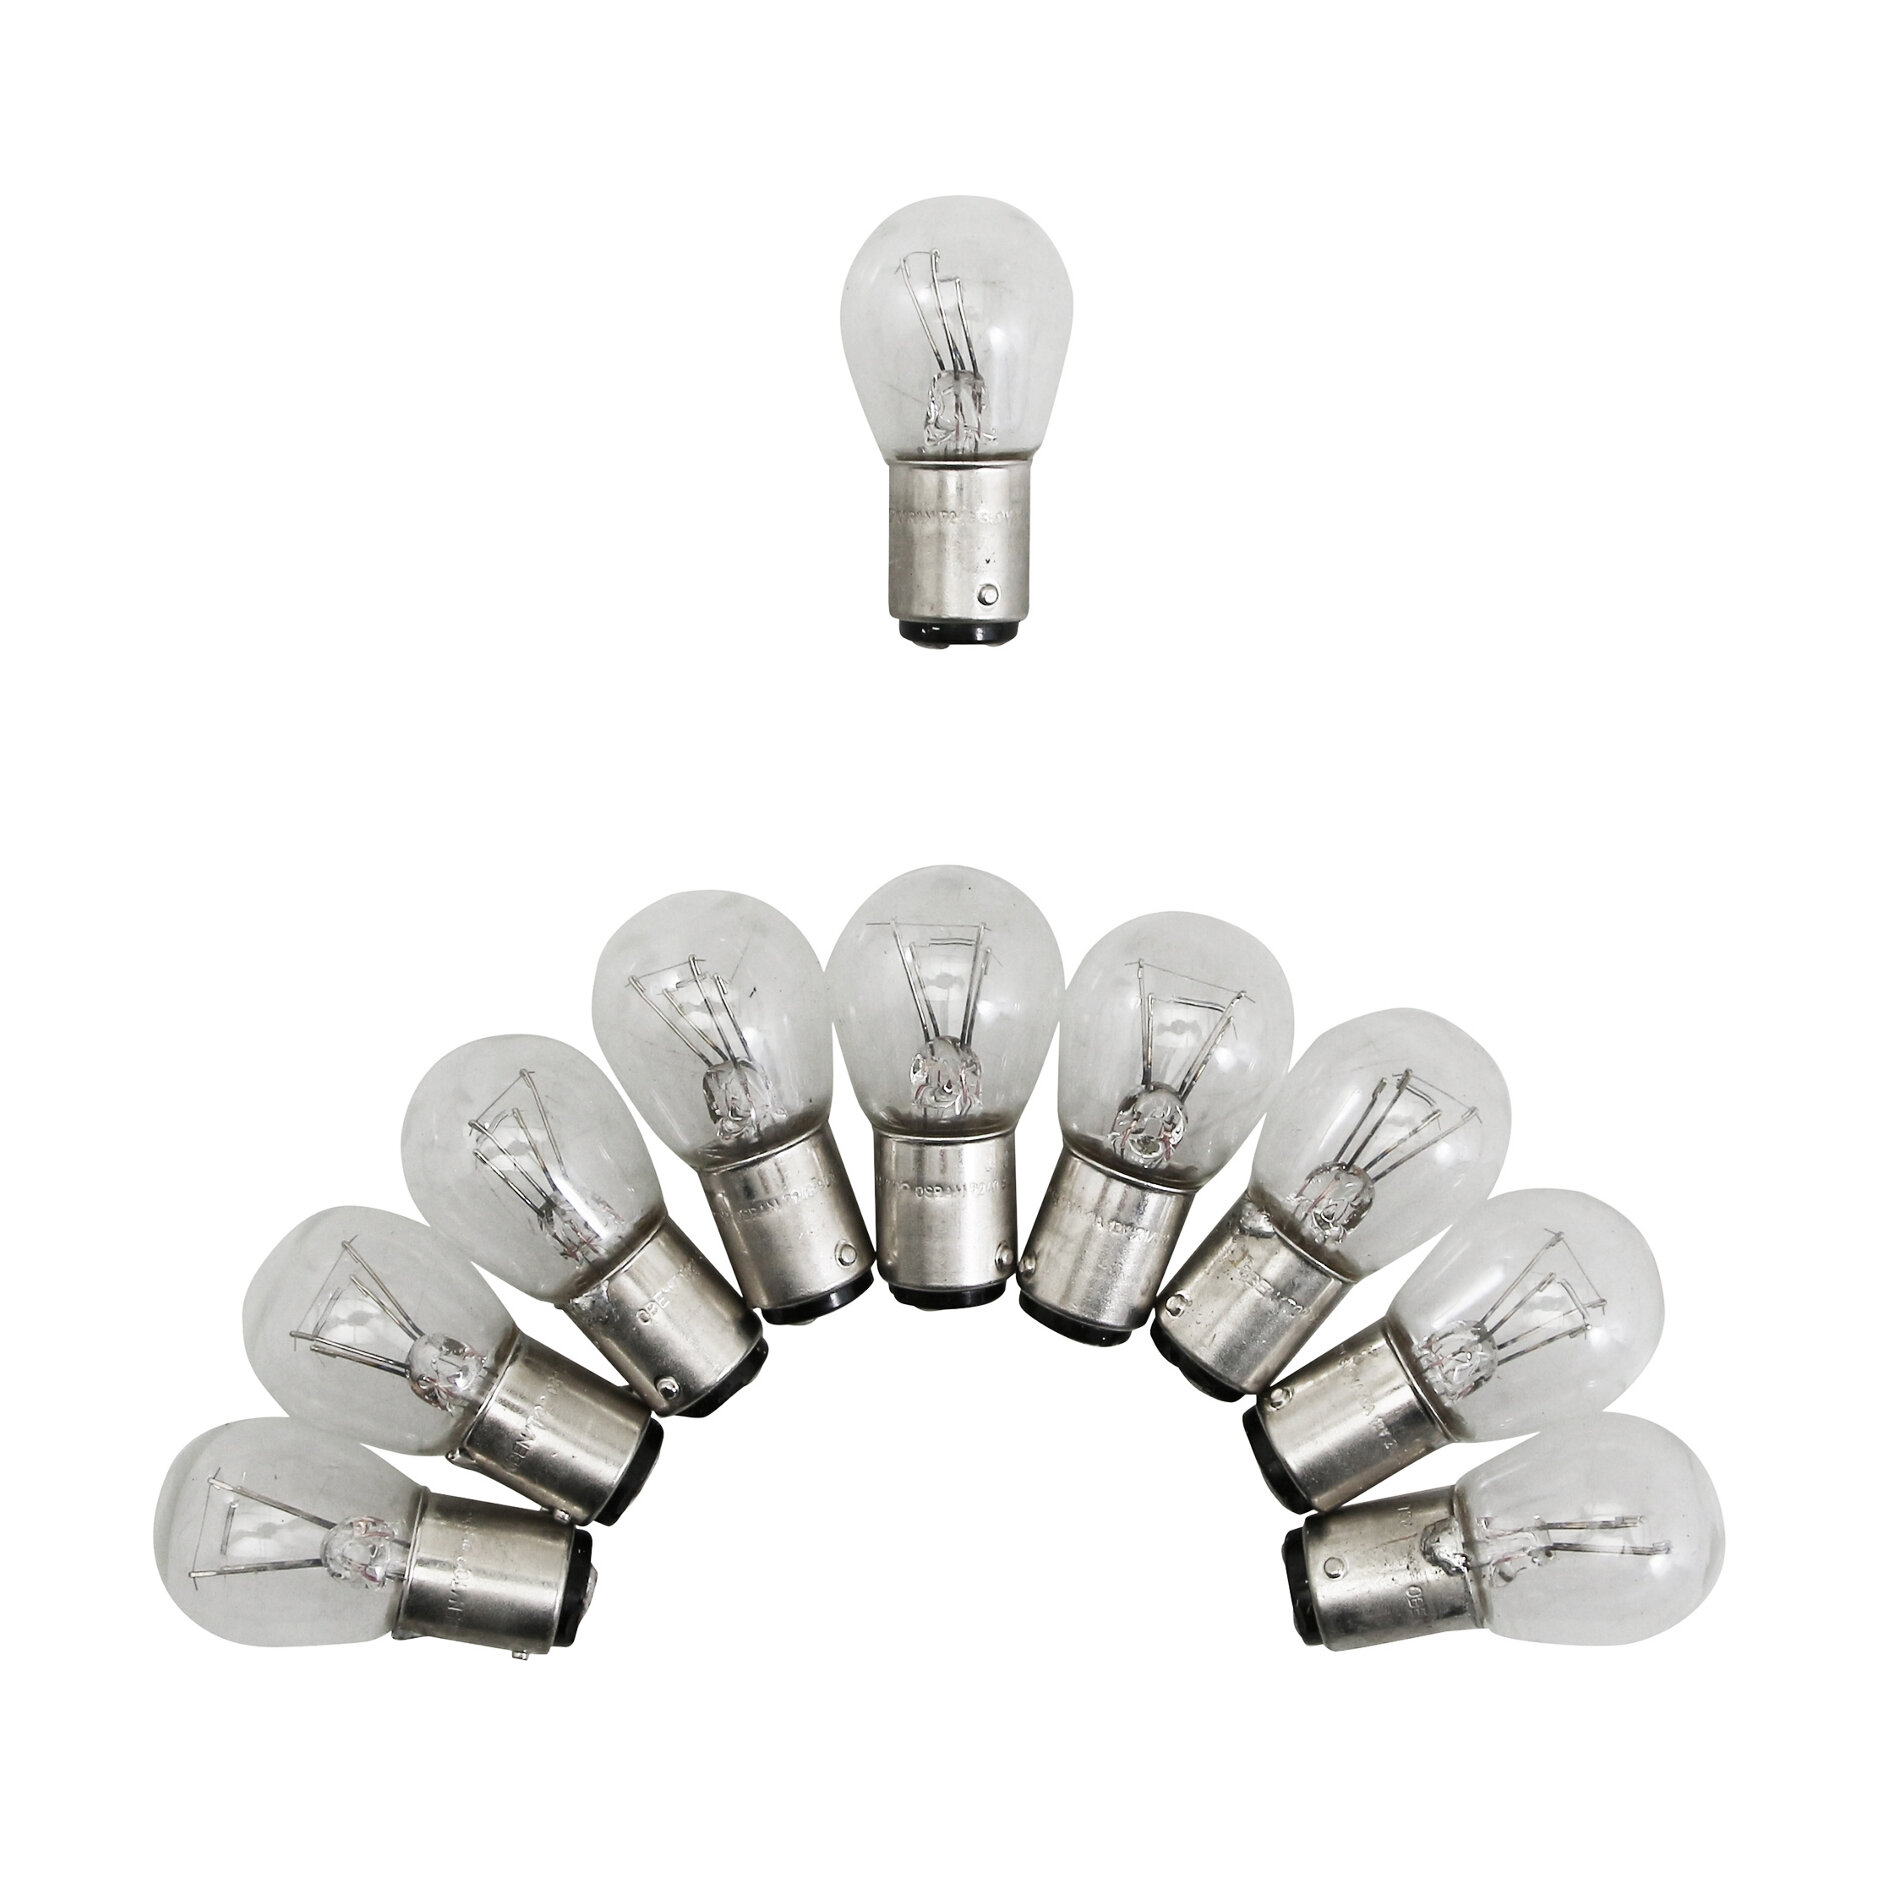 Ampoules Osram P21-5W 12V 21-5W blanc (x10)